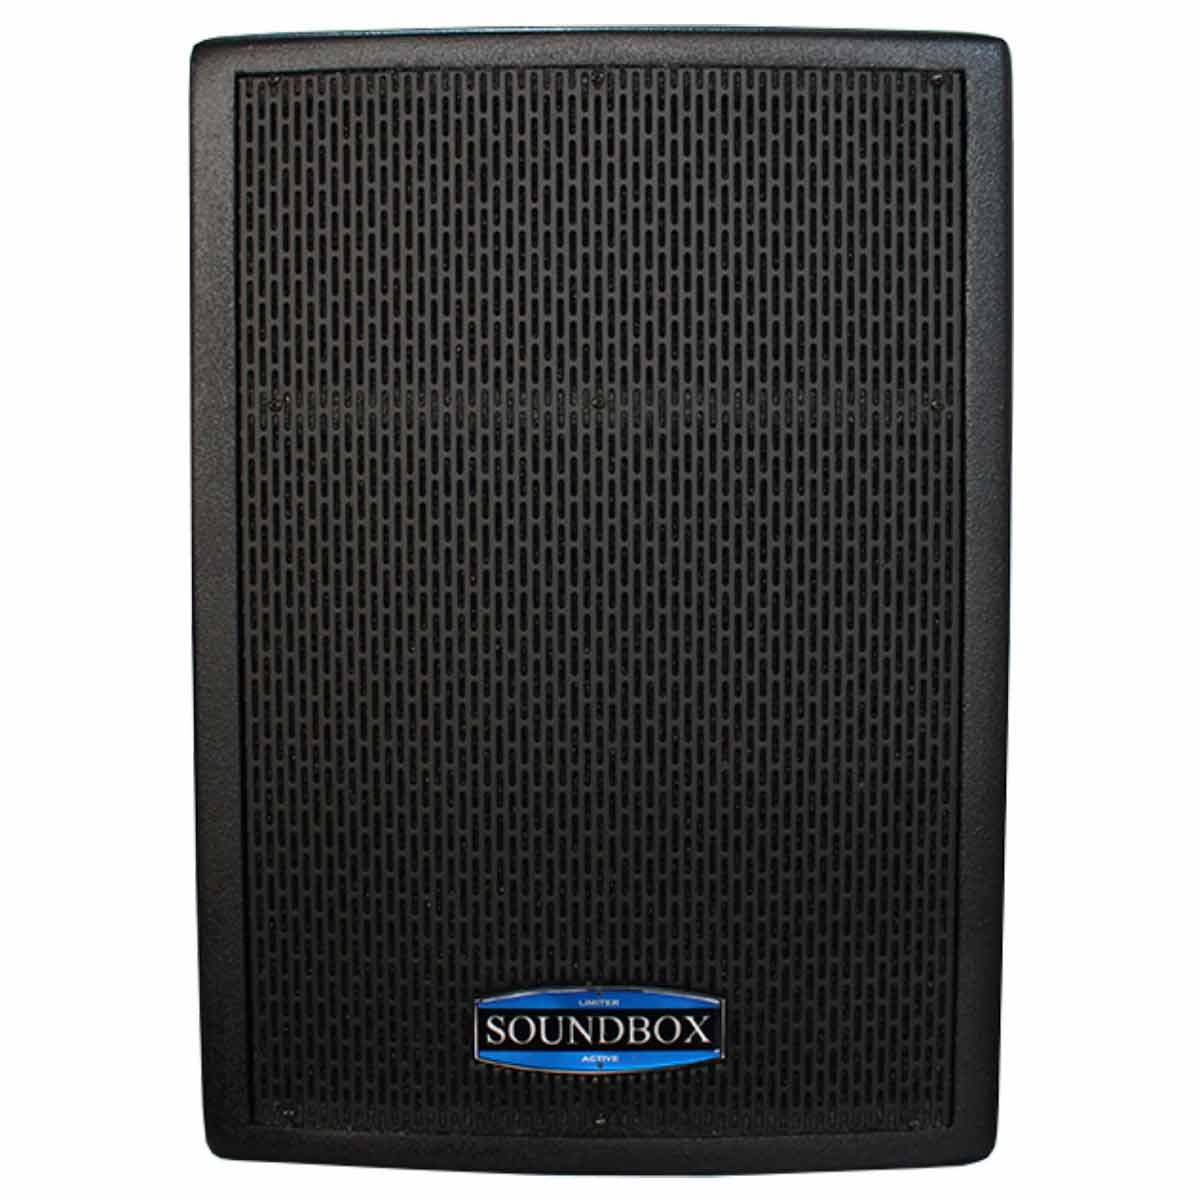 MS12 - Caixa Ativa 500W MS 12 Preta - SoundBox